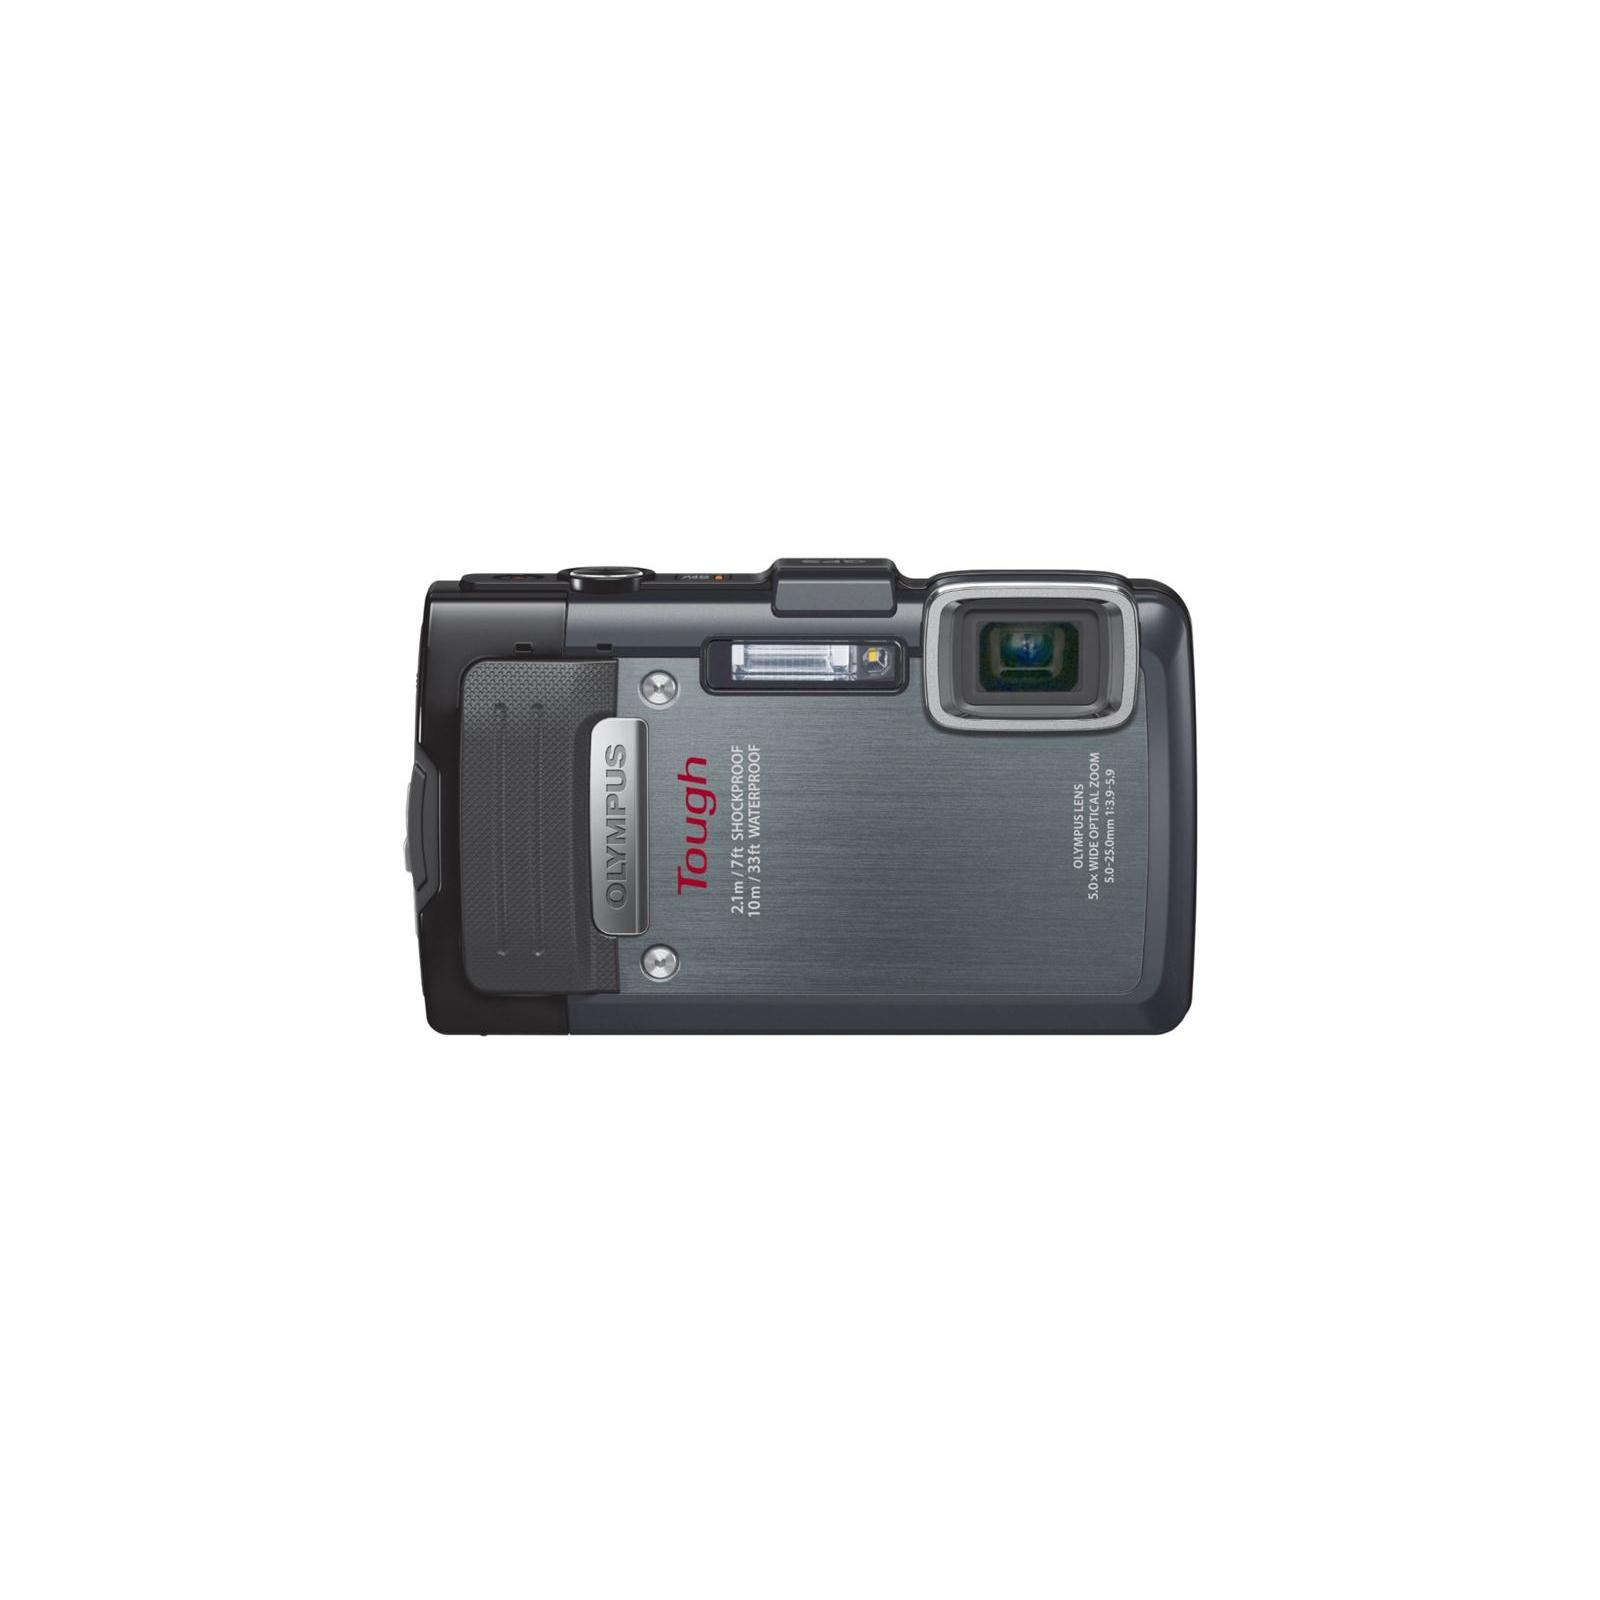 Цифровой фотоаппарат OLYMPUS TG-835 Black (Waterproof - 10m; GPS) (V104131BE000) изображение 2